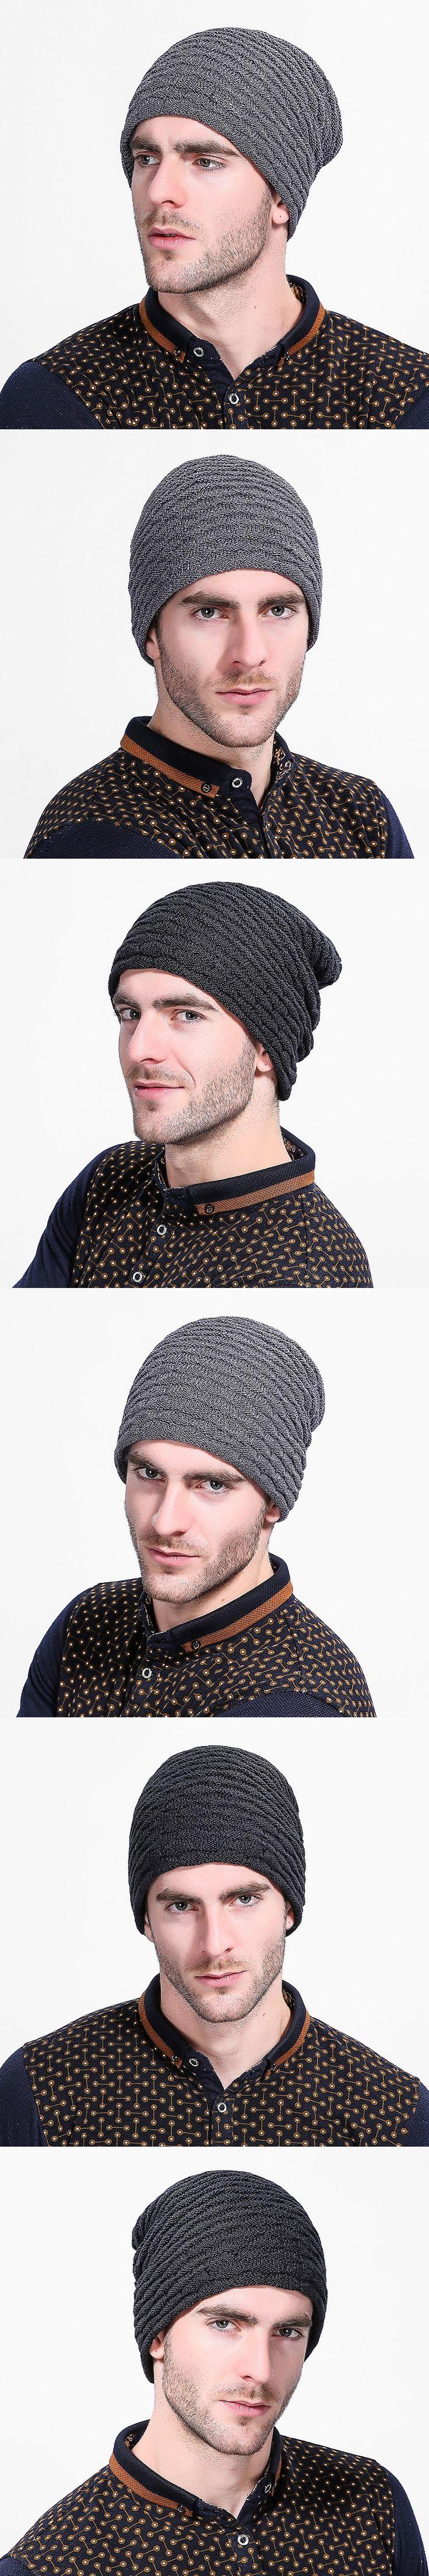 2018 Winter Beanies Men Scarf Knitted Hat Caps Mask Bonnet Warm Baggy Winter Hats For Men Beanies Hats M004